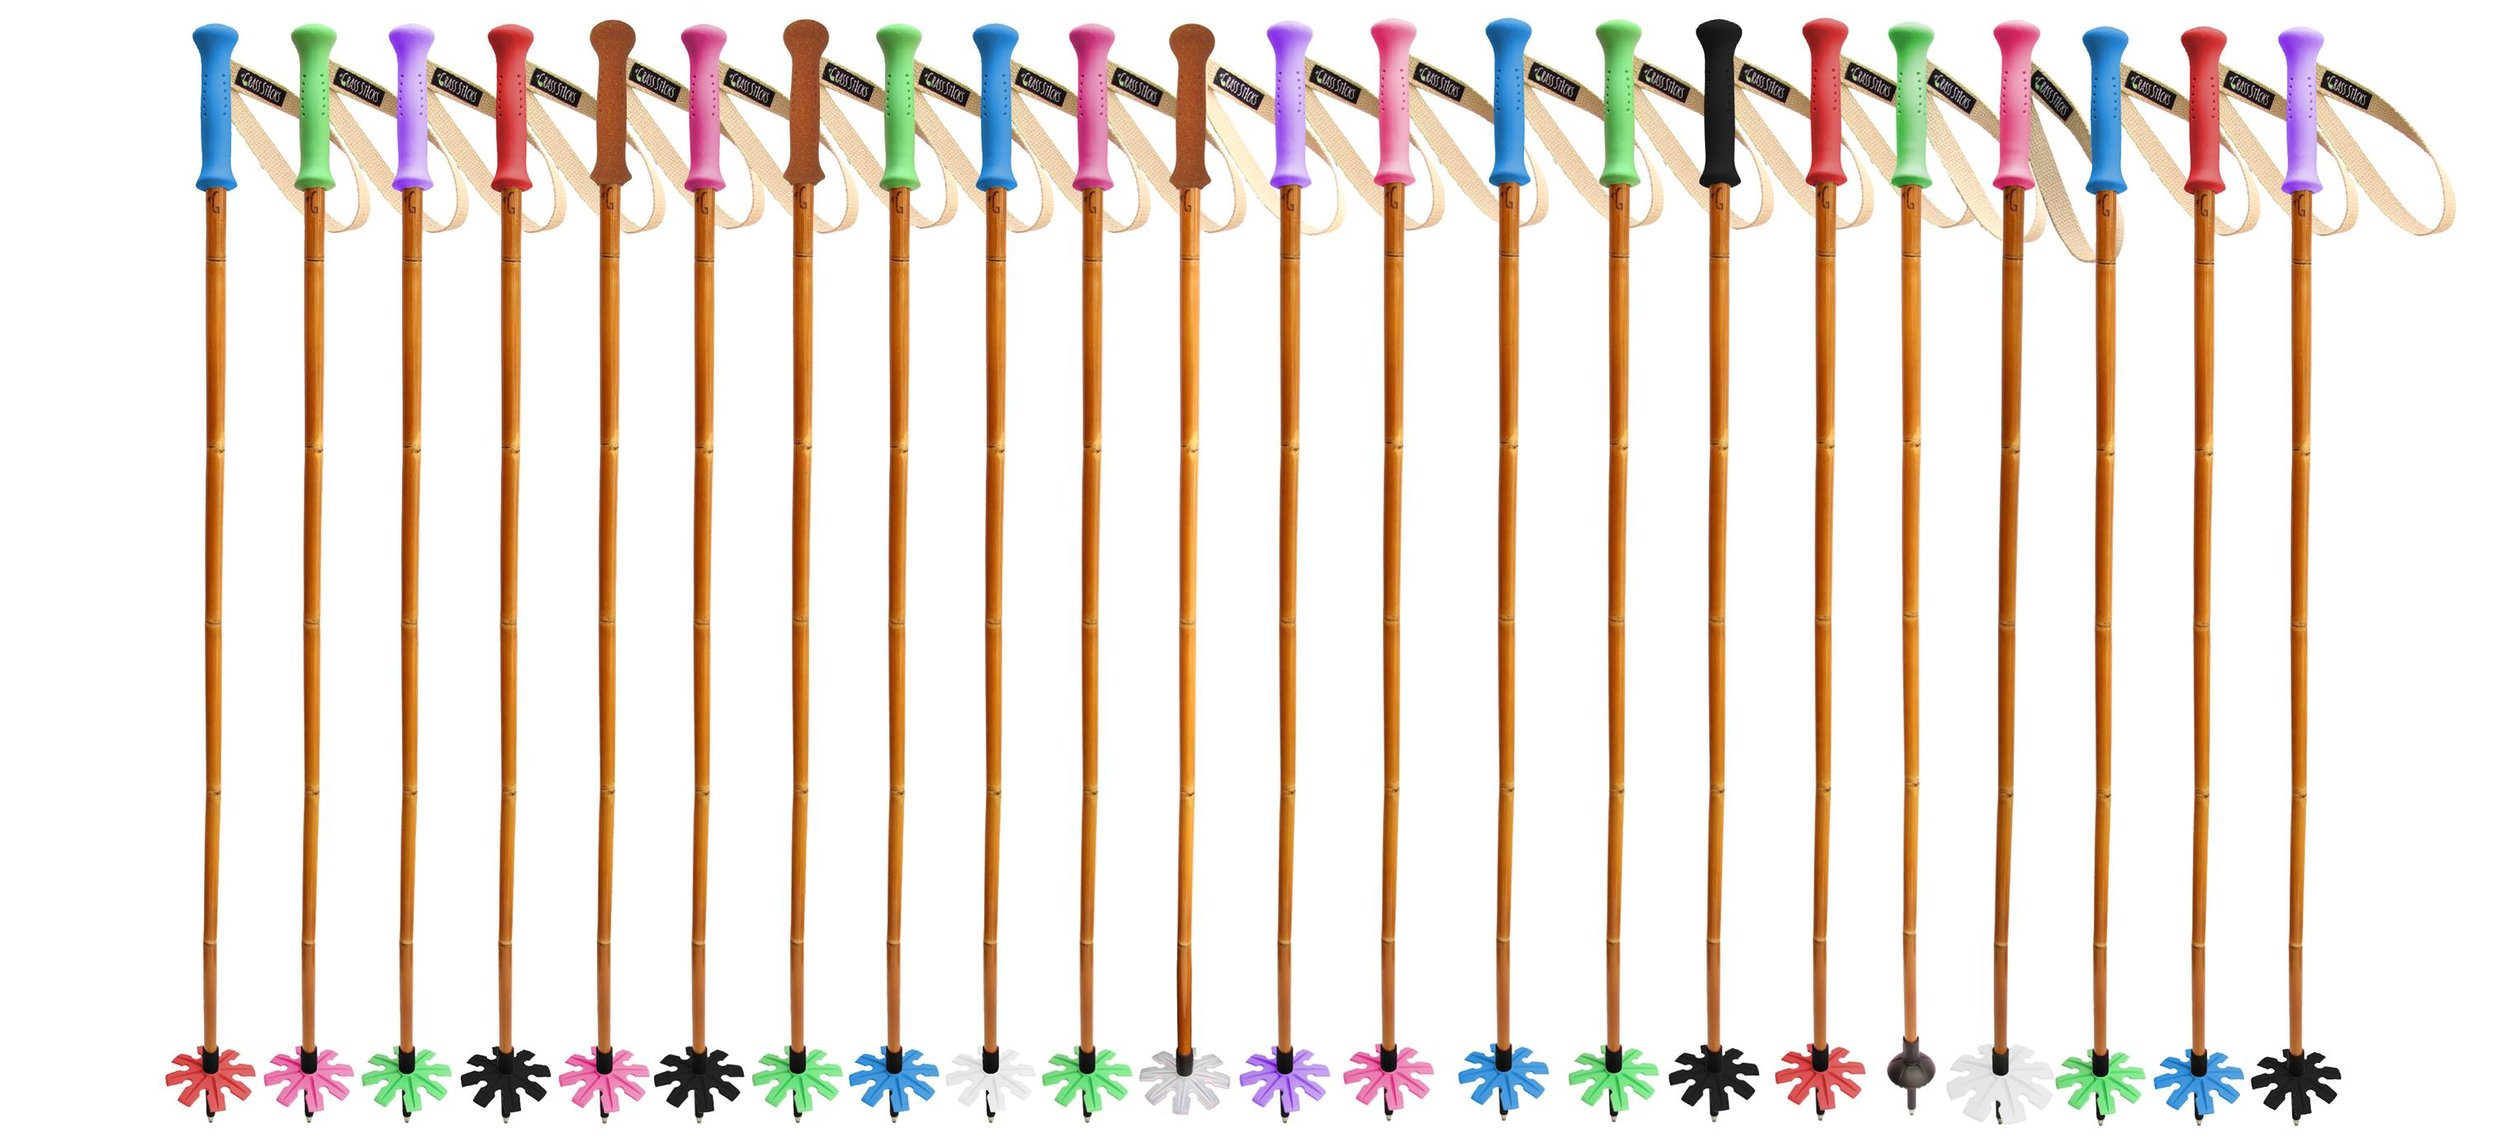 Grass Sticks Ski Poles